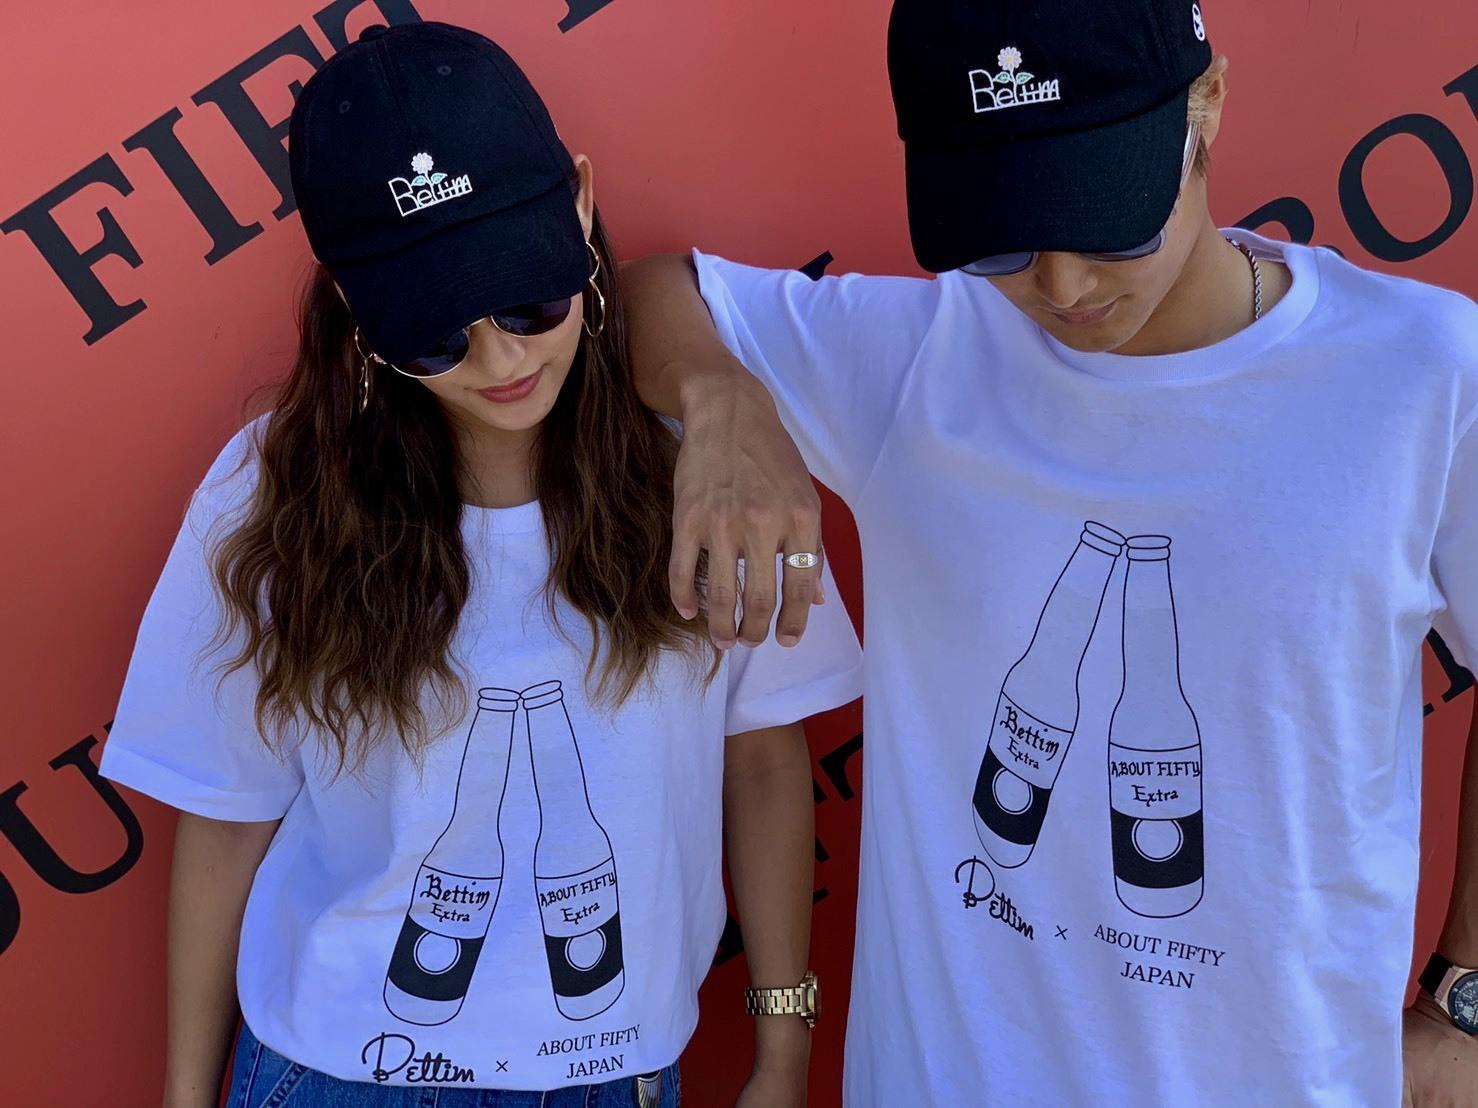 Bettim × ABOUT FIFTY コラボTシャツ